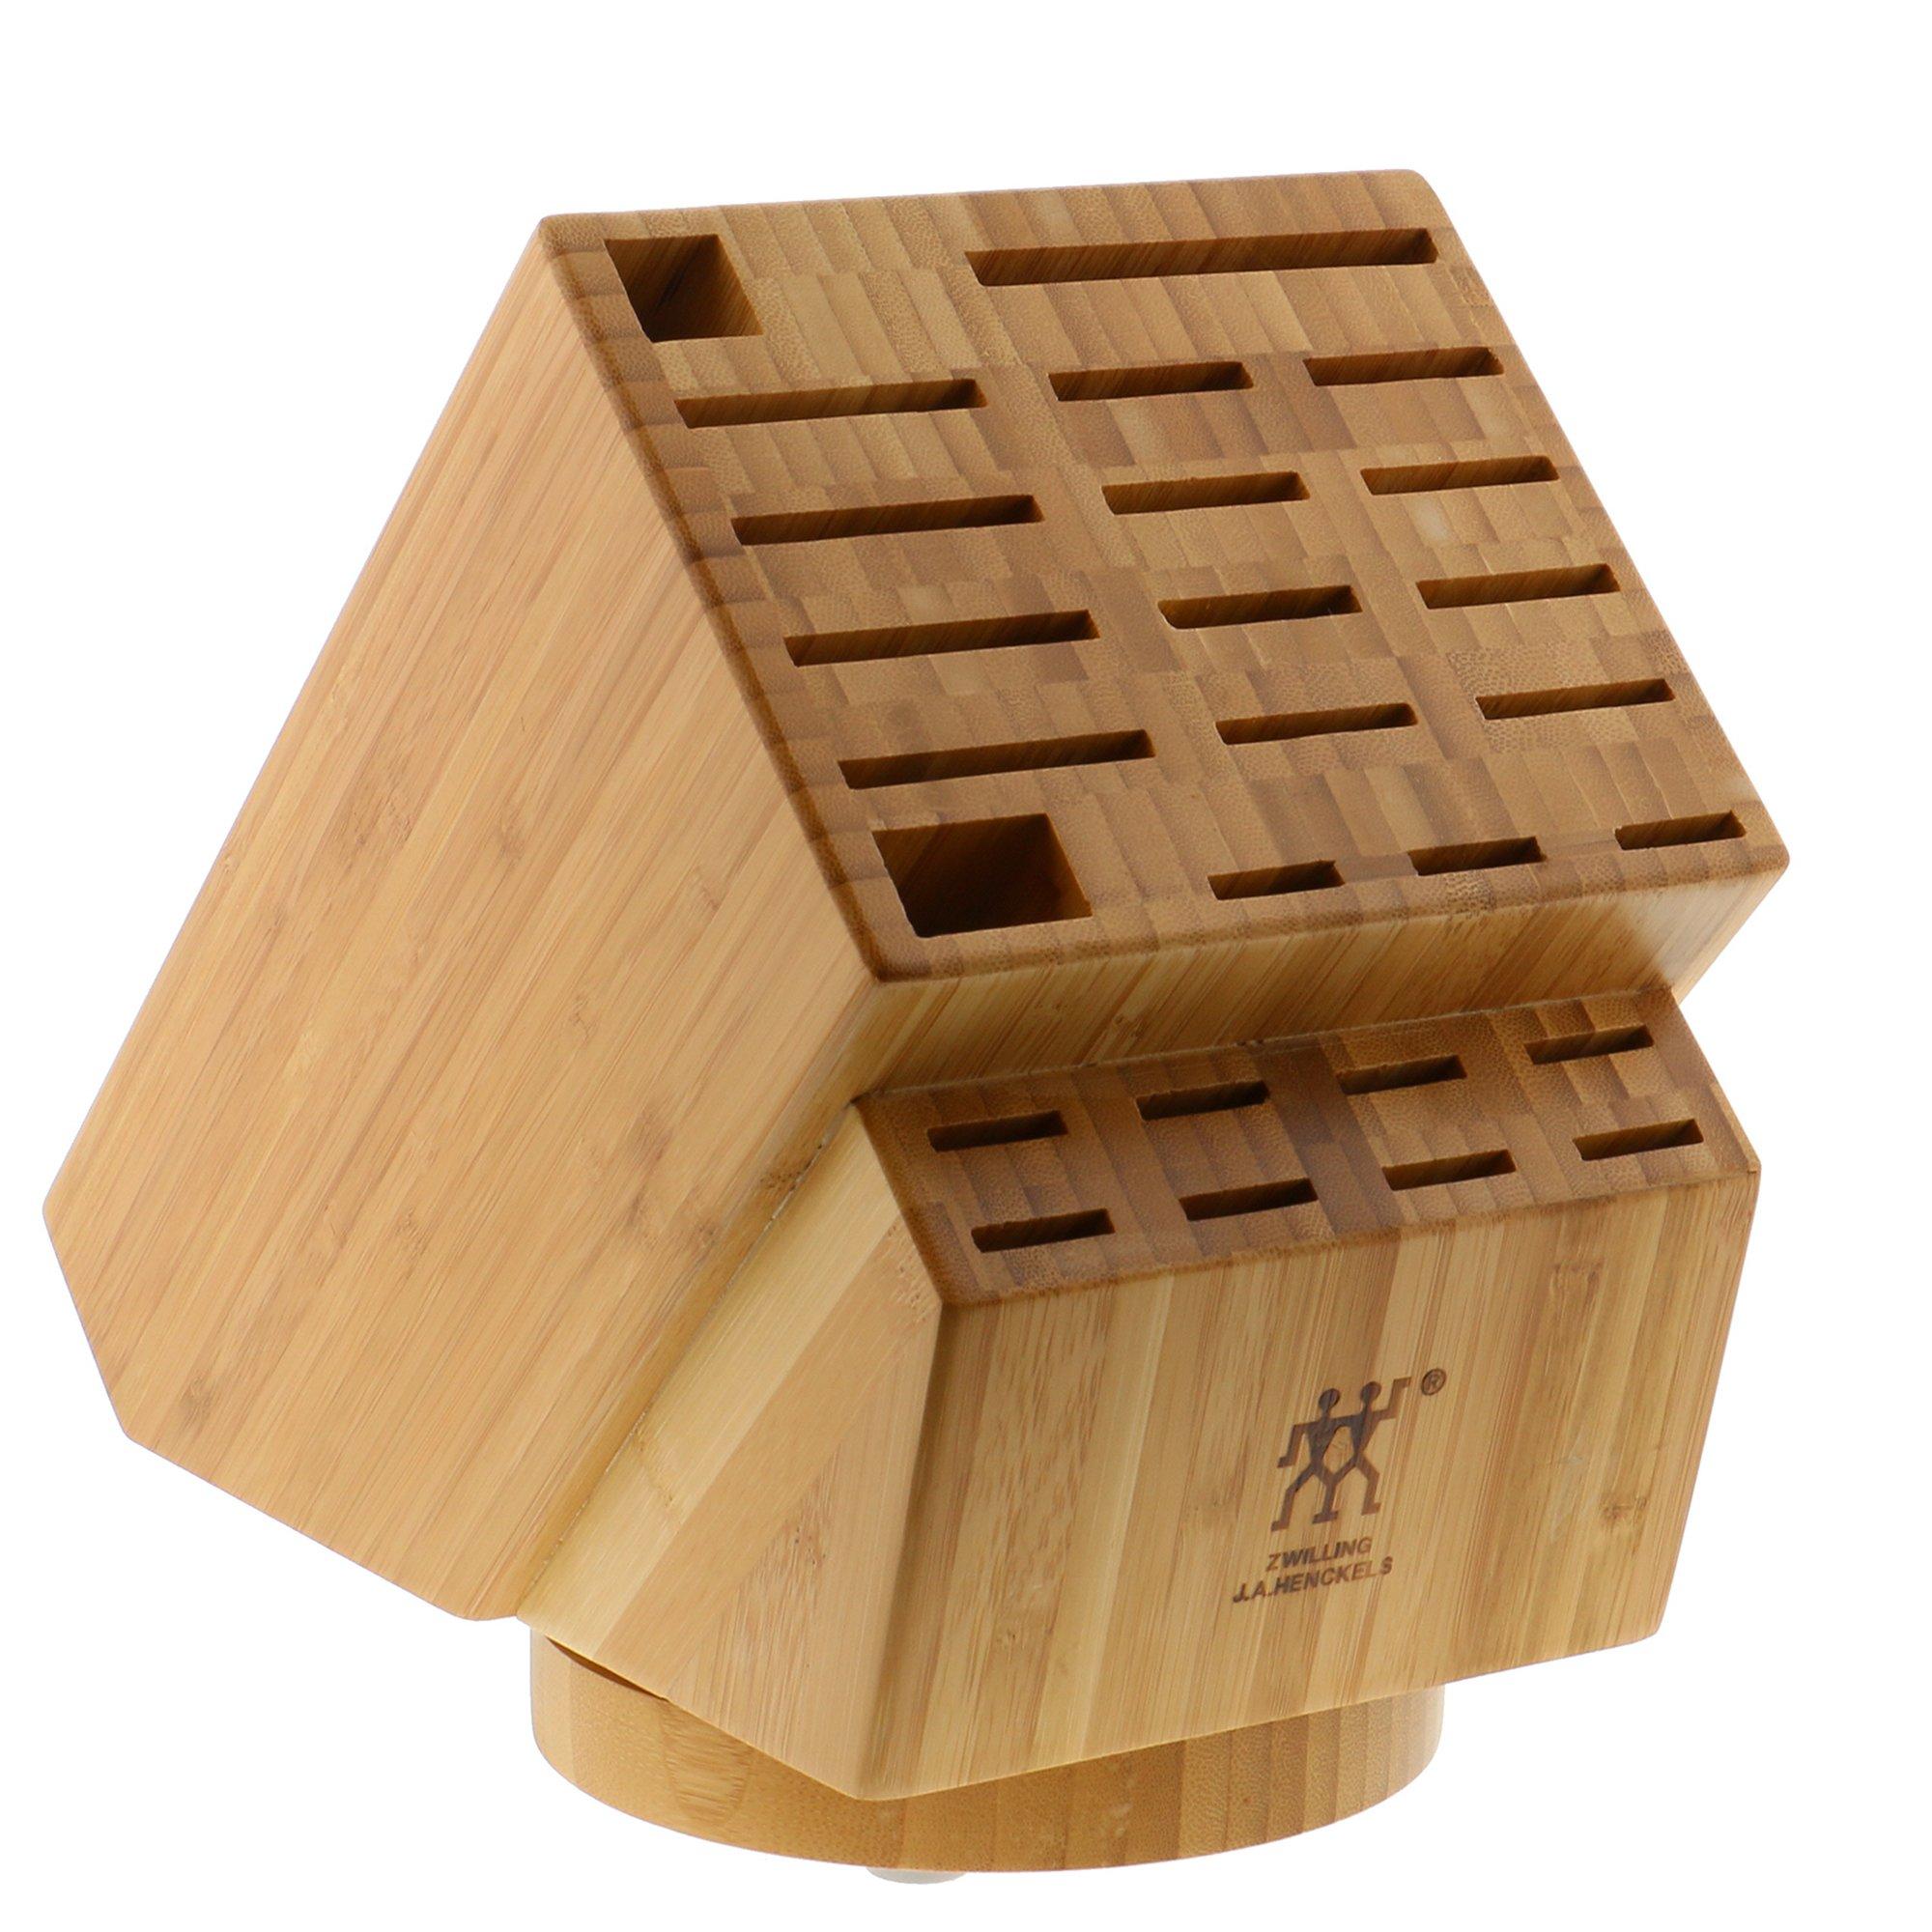 Zwilling J.A. Henckels 35101-840 26-Slot Bamboo Swivel Knife Block